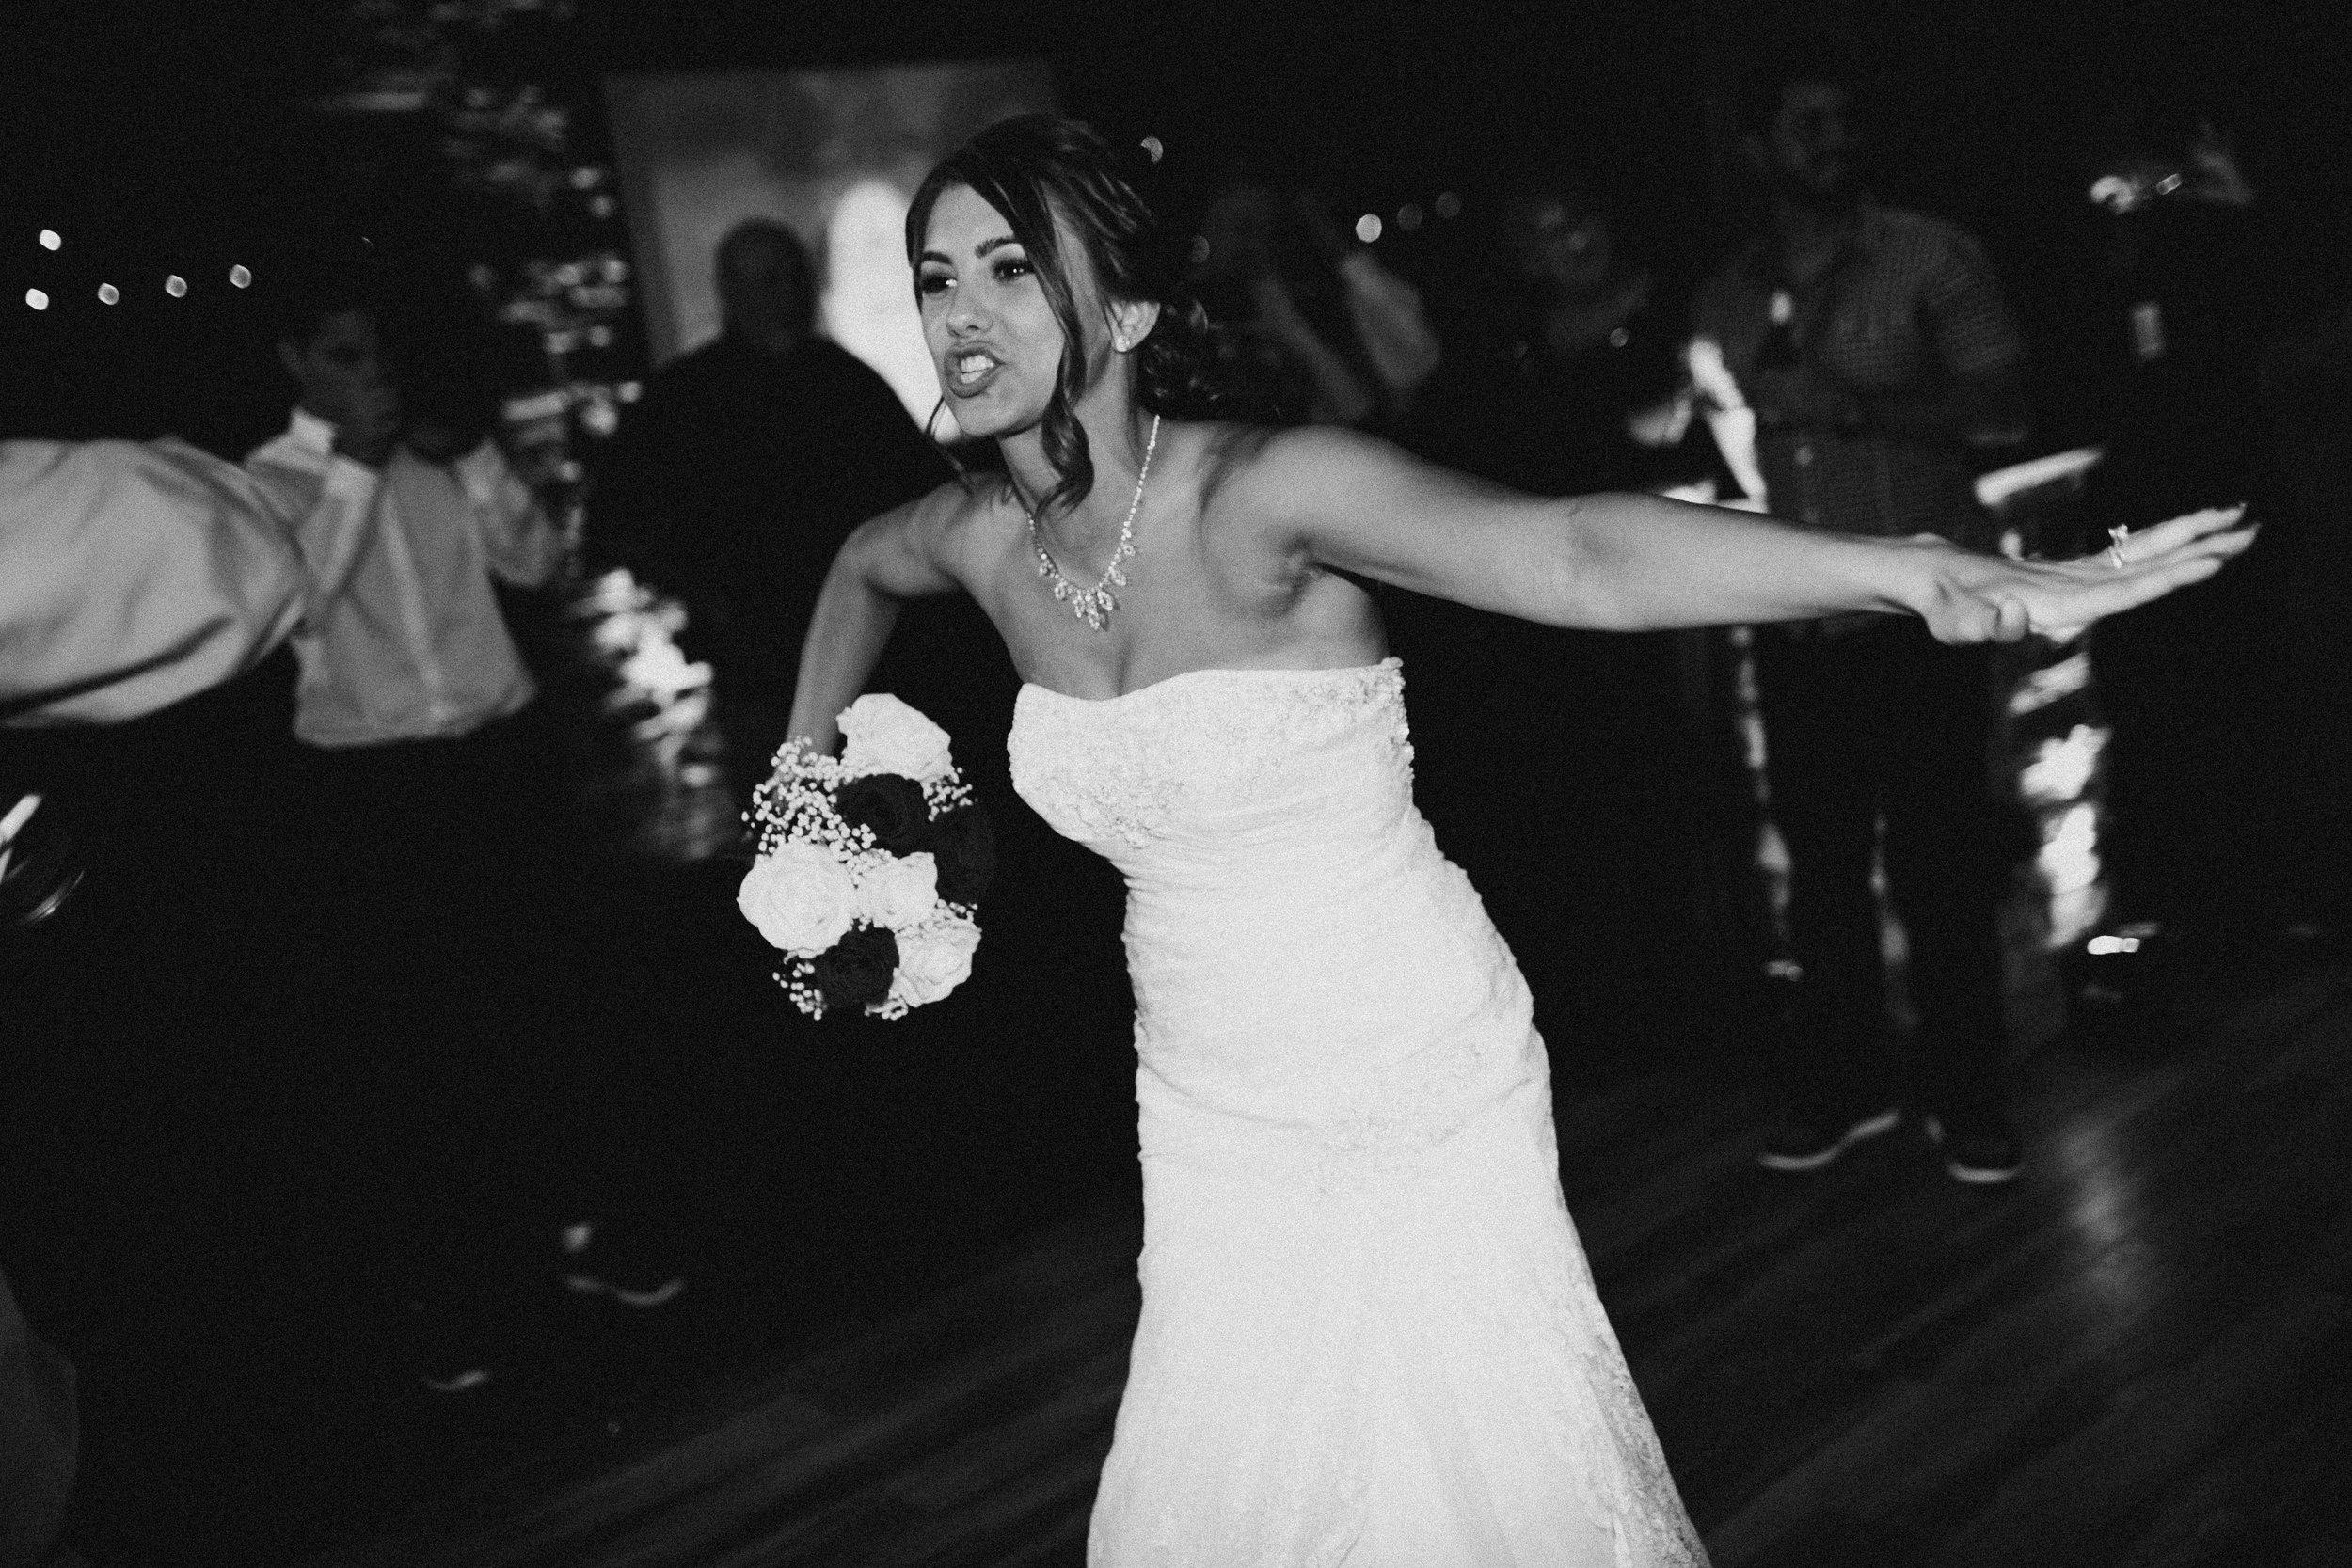 Cheyenne + Jordan - Wedding, Natalie Griffo (127 of 157).jpg